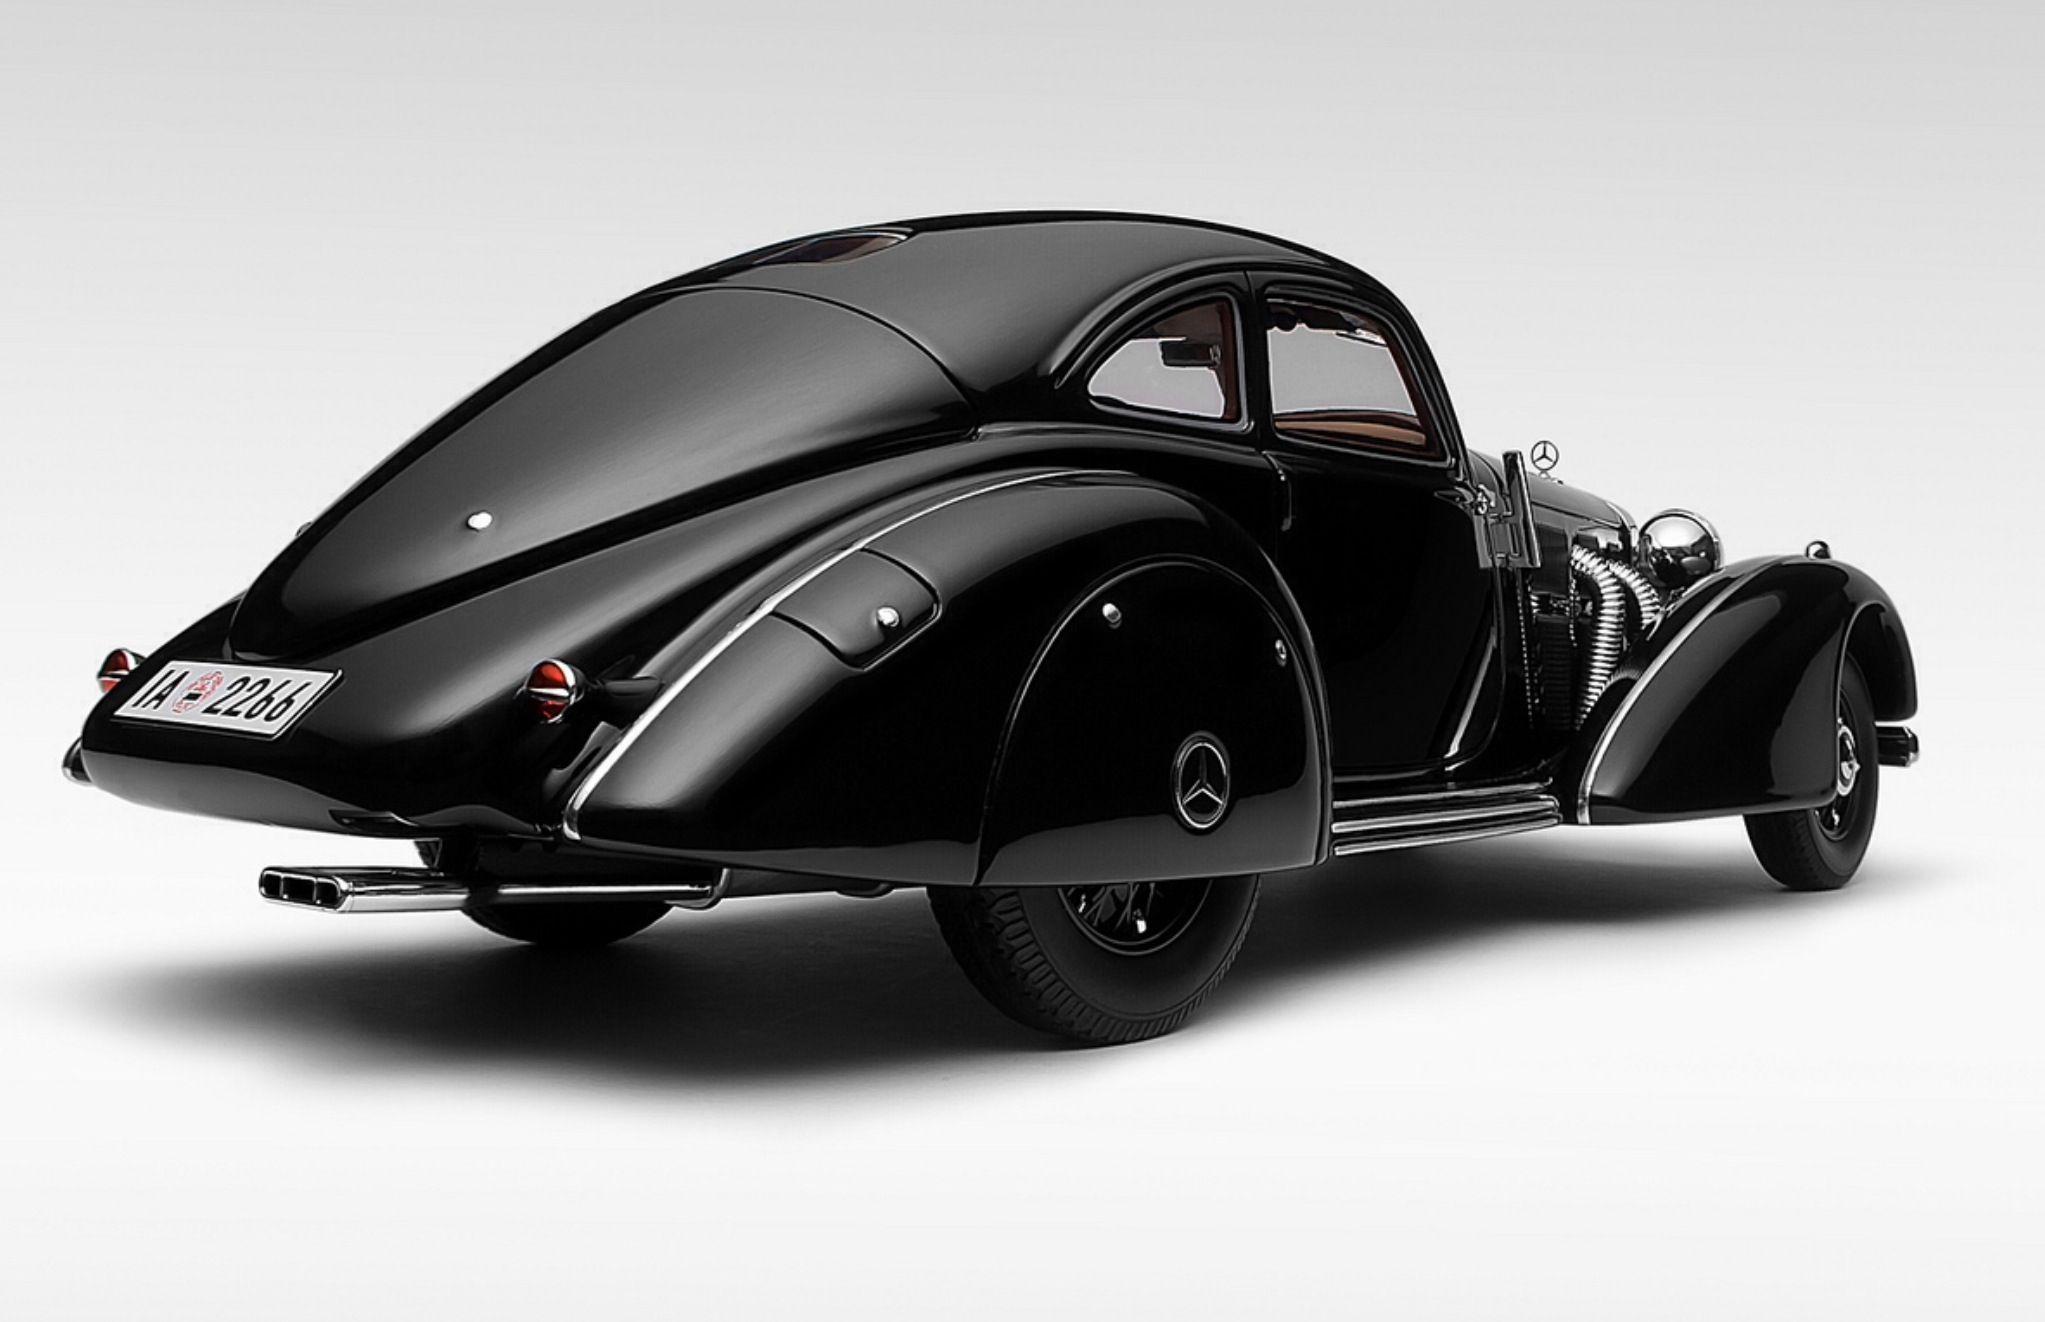 1934 Mercedes-Benz 540K Autobahn Kuner Coupe | \'30s Coupes ...